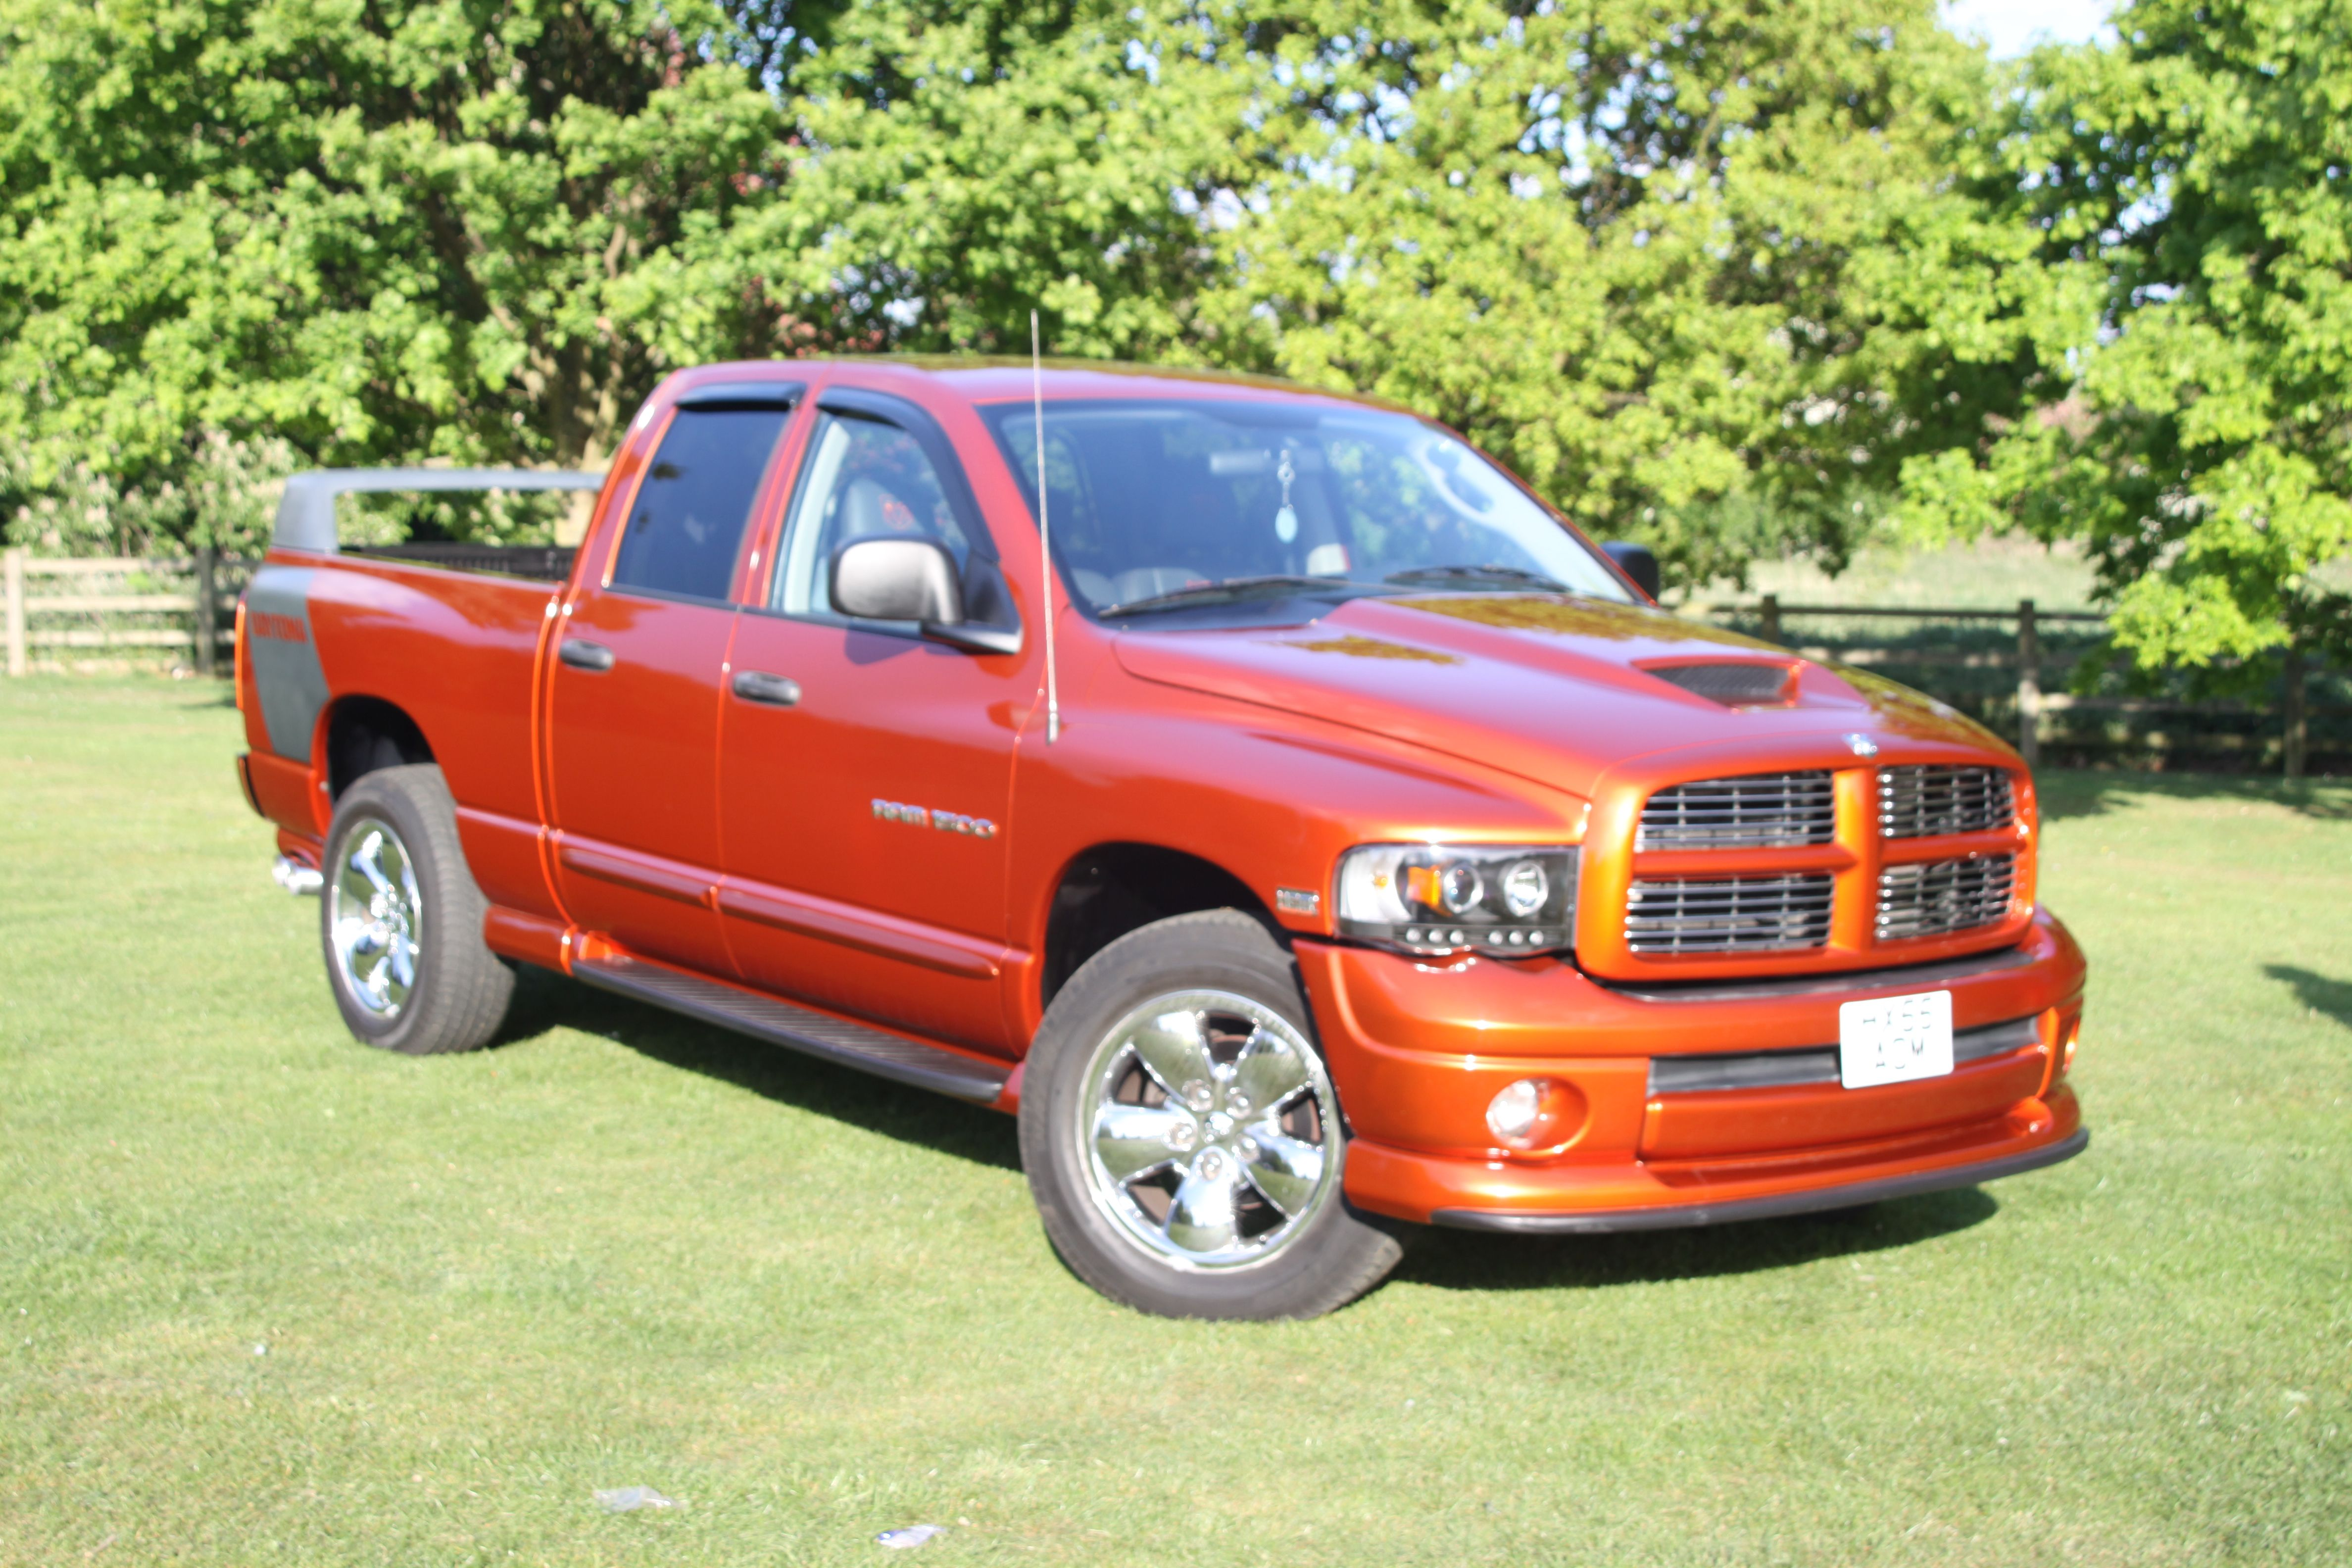 Orange Red Dodge Ram Truck Dodge Trucks Ram Dodge Trucks Ram Trucks